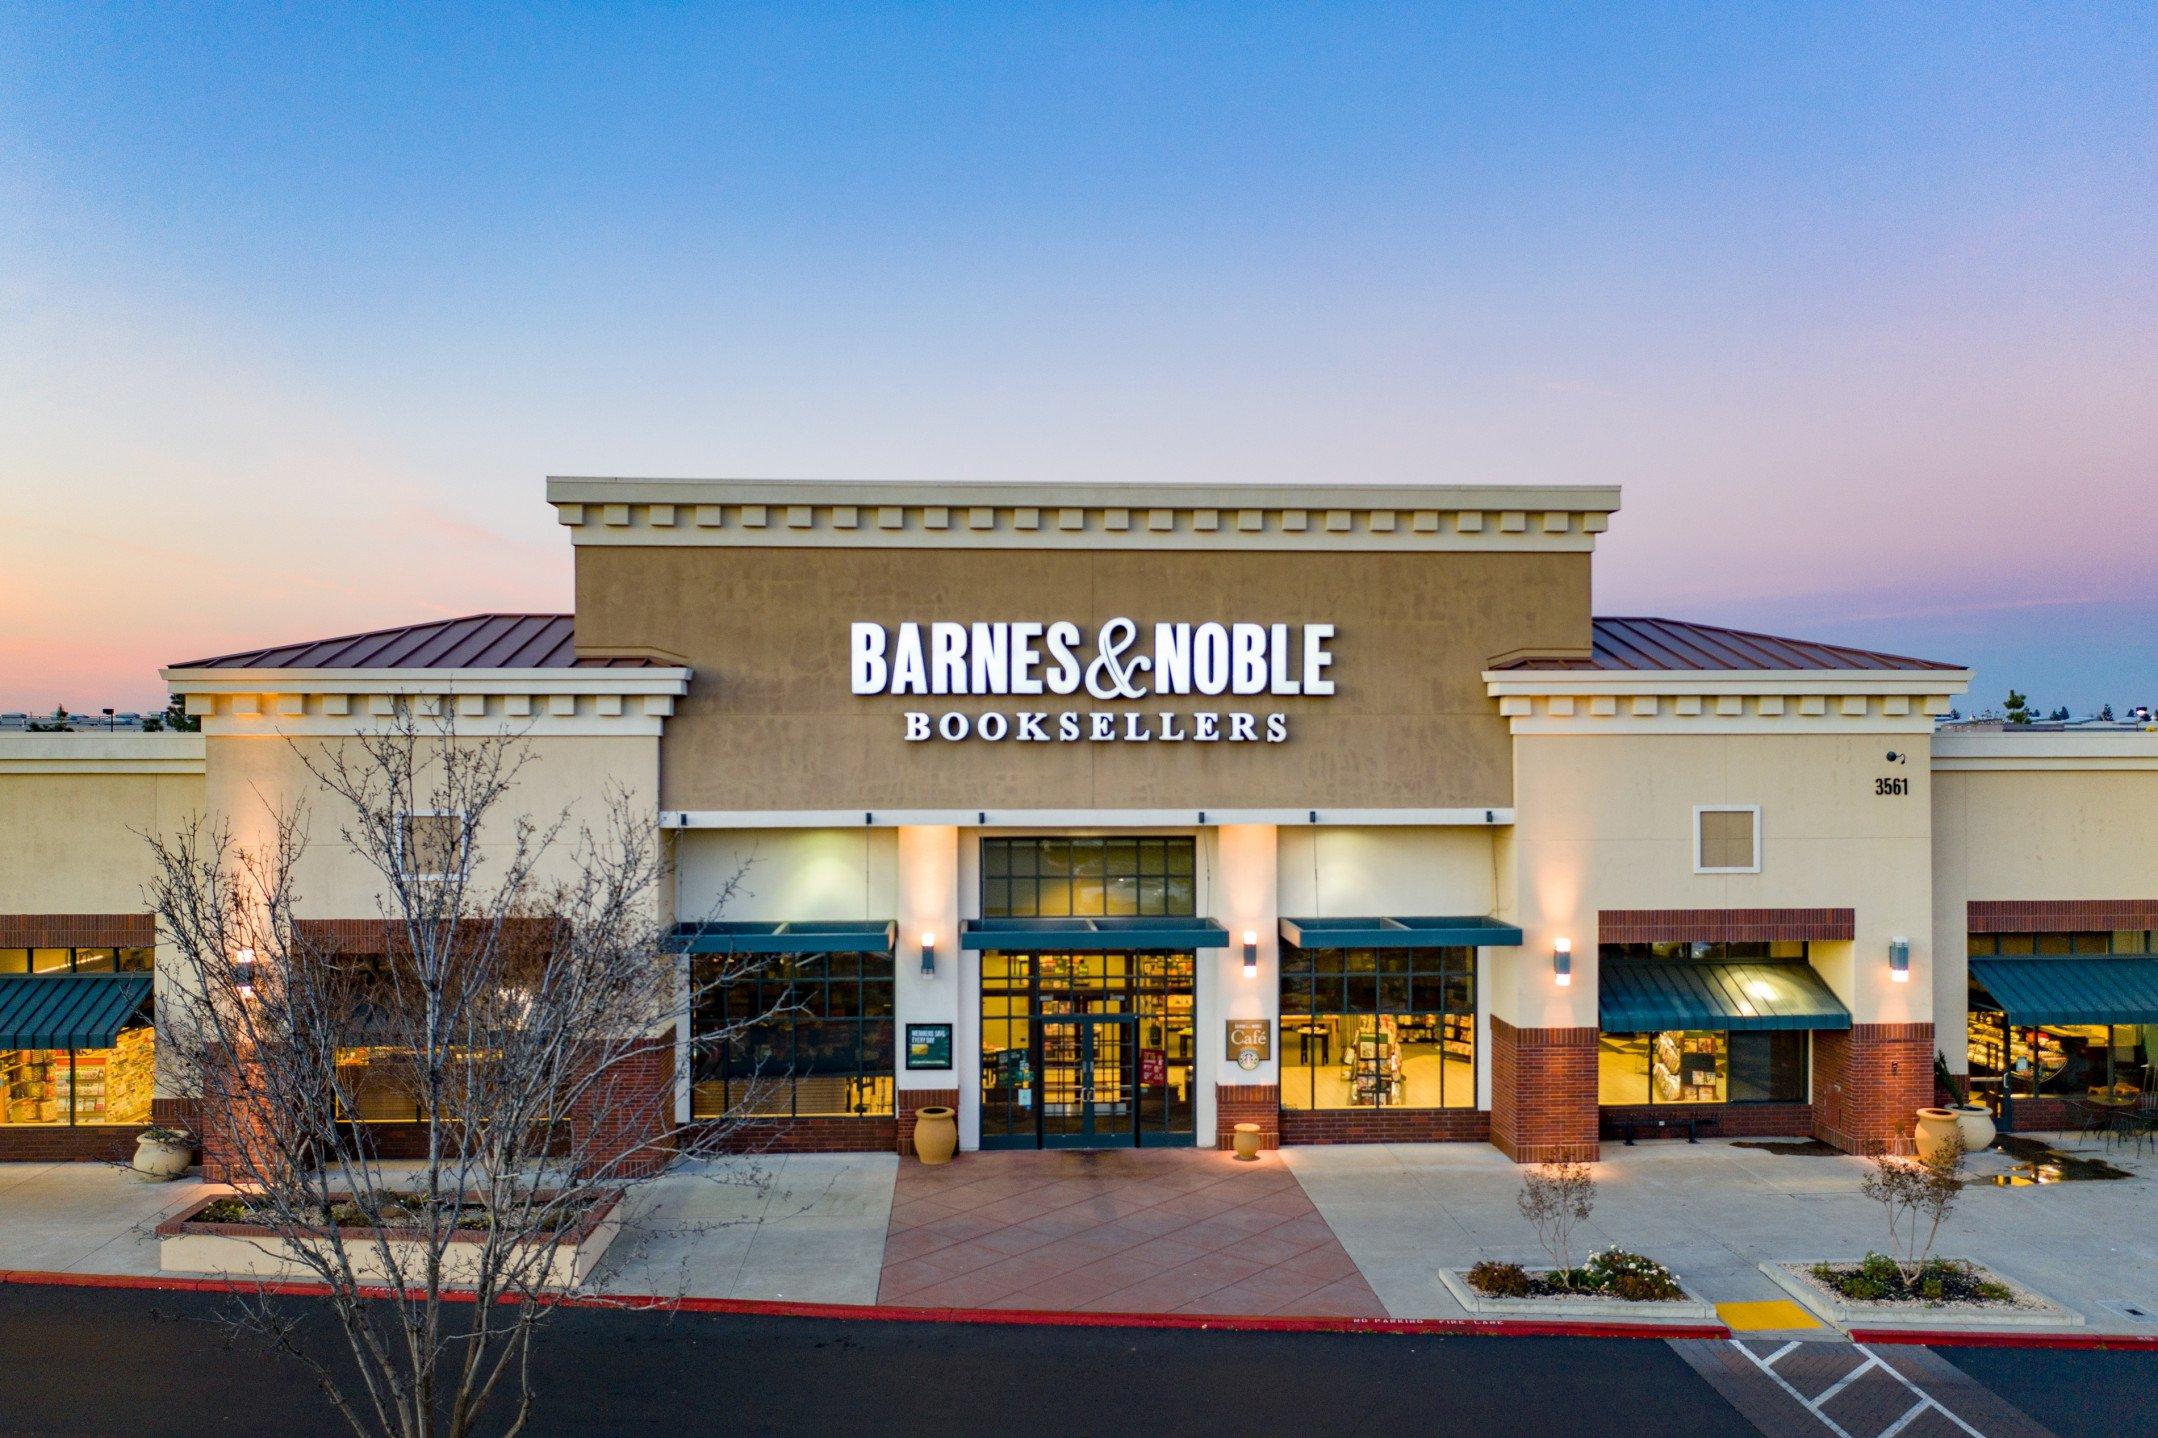 Barnes & Noble